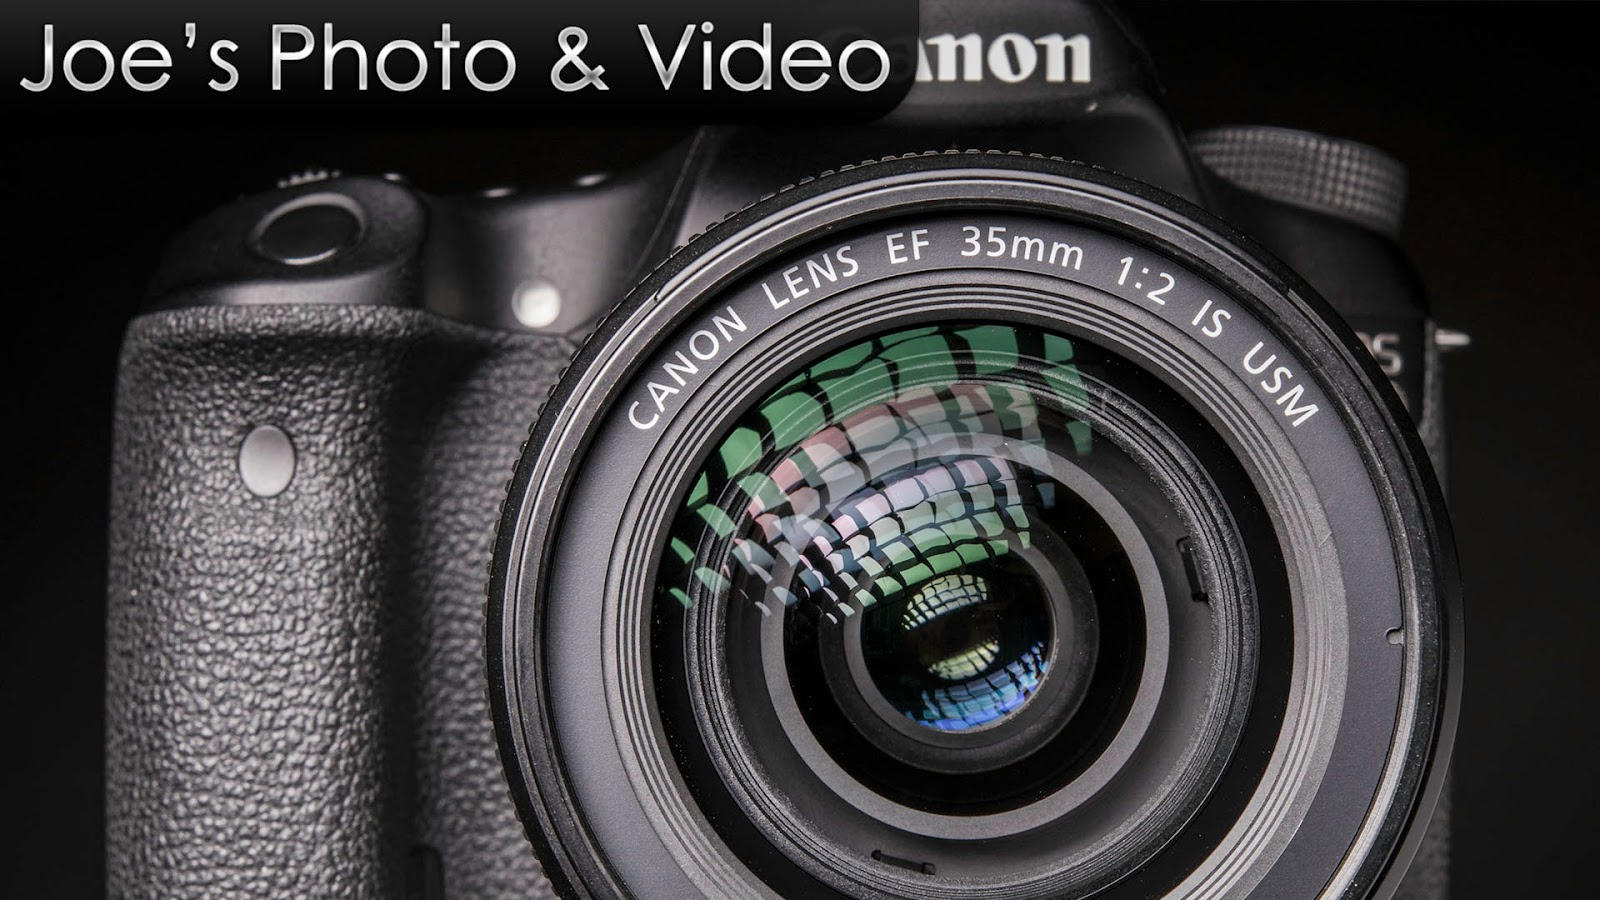 canon ef 35mm f 2 is usm lens review plus photo video samples on eos 80d. Black Bedroom Furniture Sets. Home Design Ideas